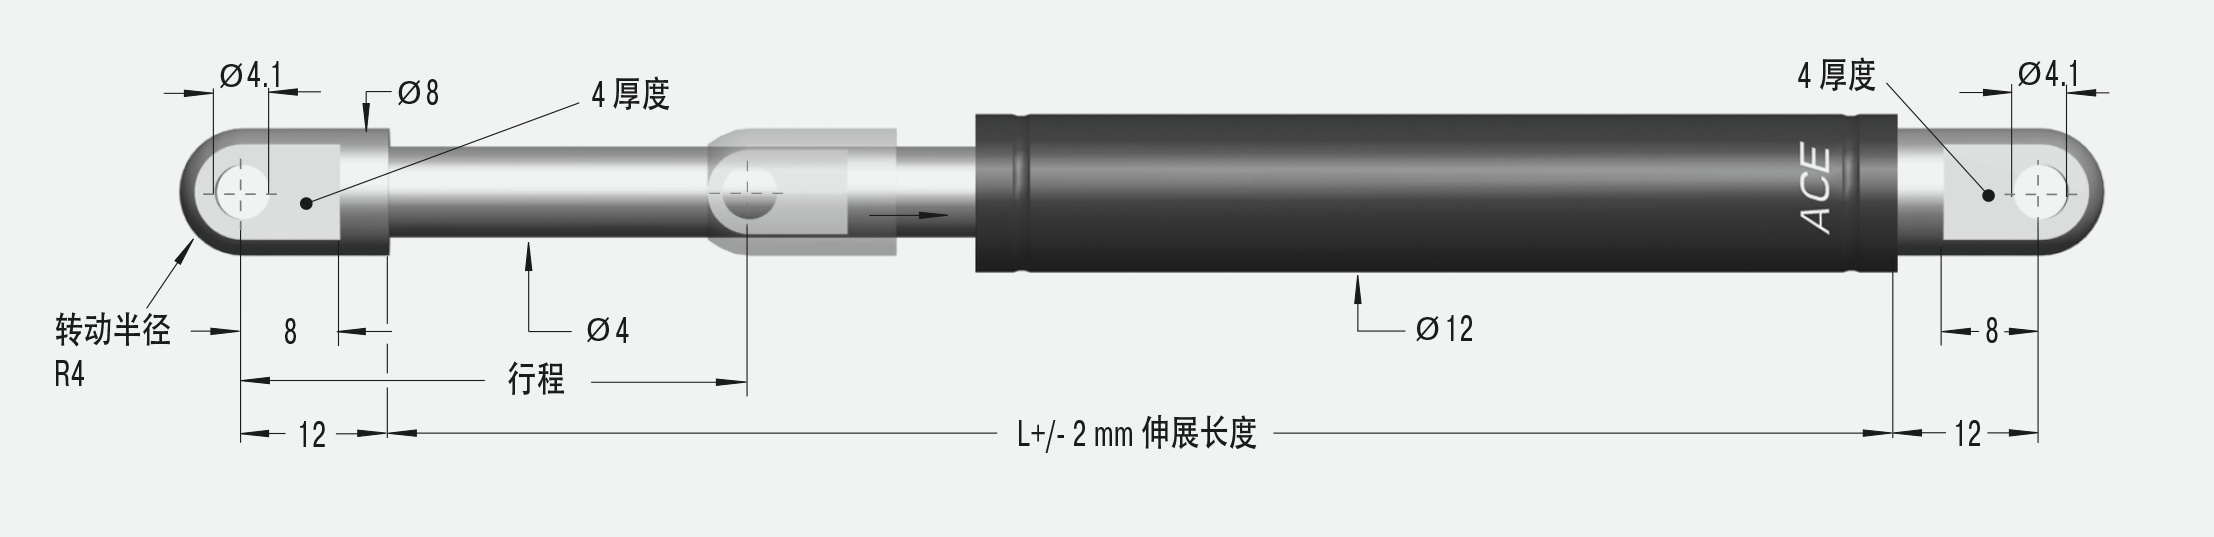 HB-12-30